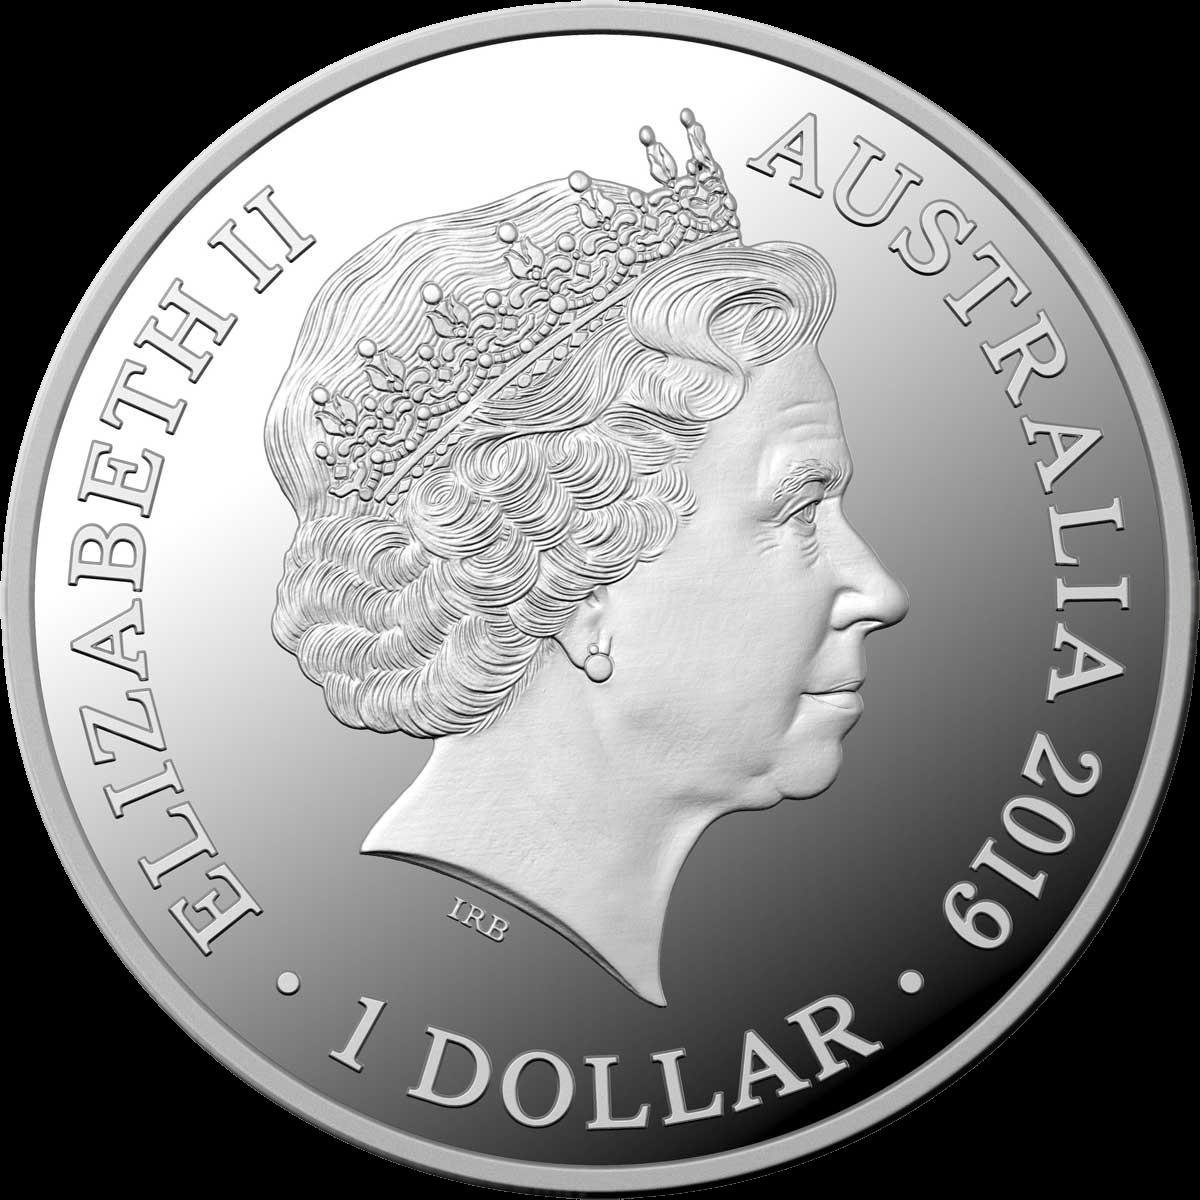 Австралия монета 1 доллар 50 лет высадки на Луне, аверс